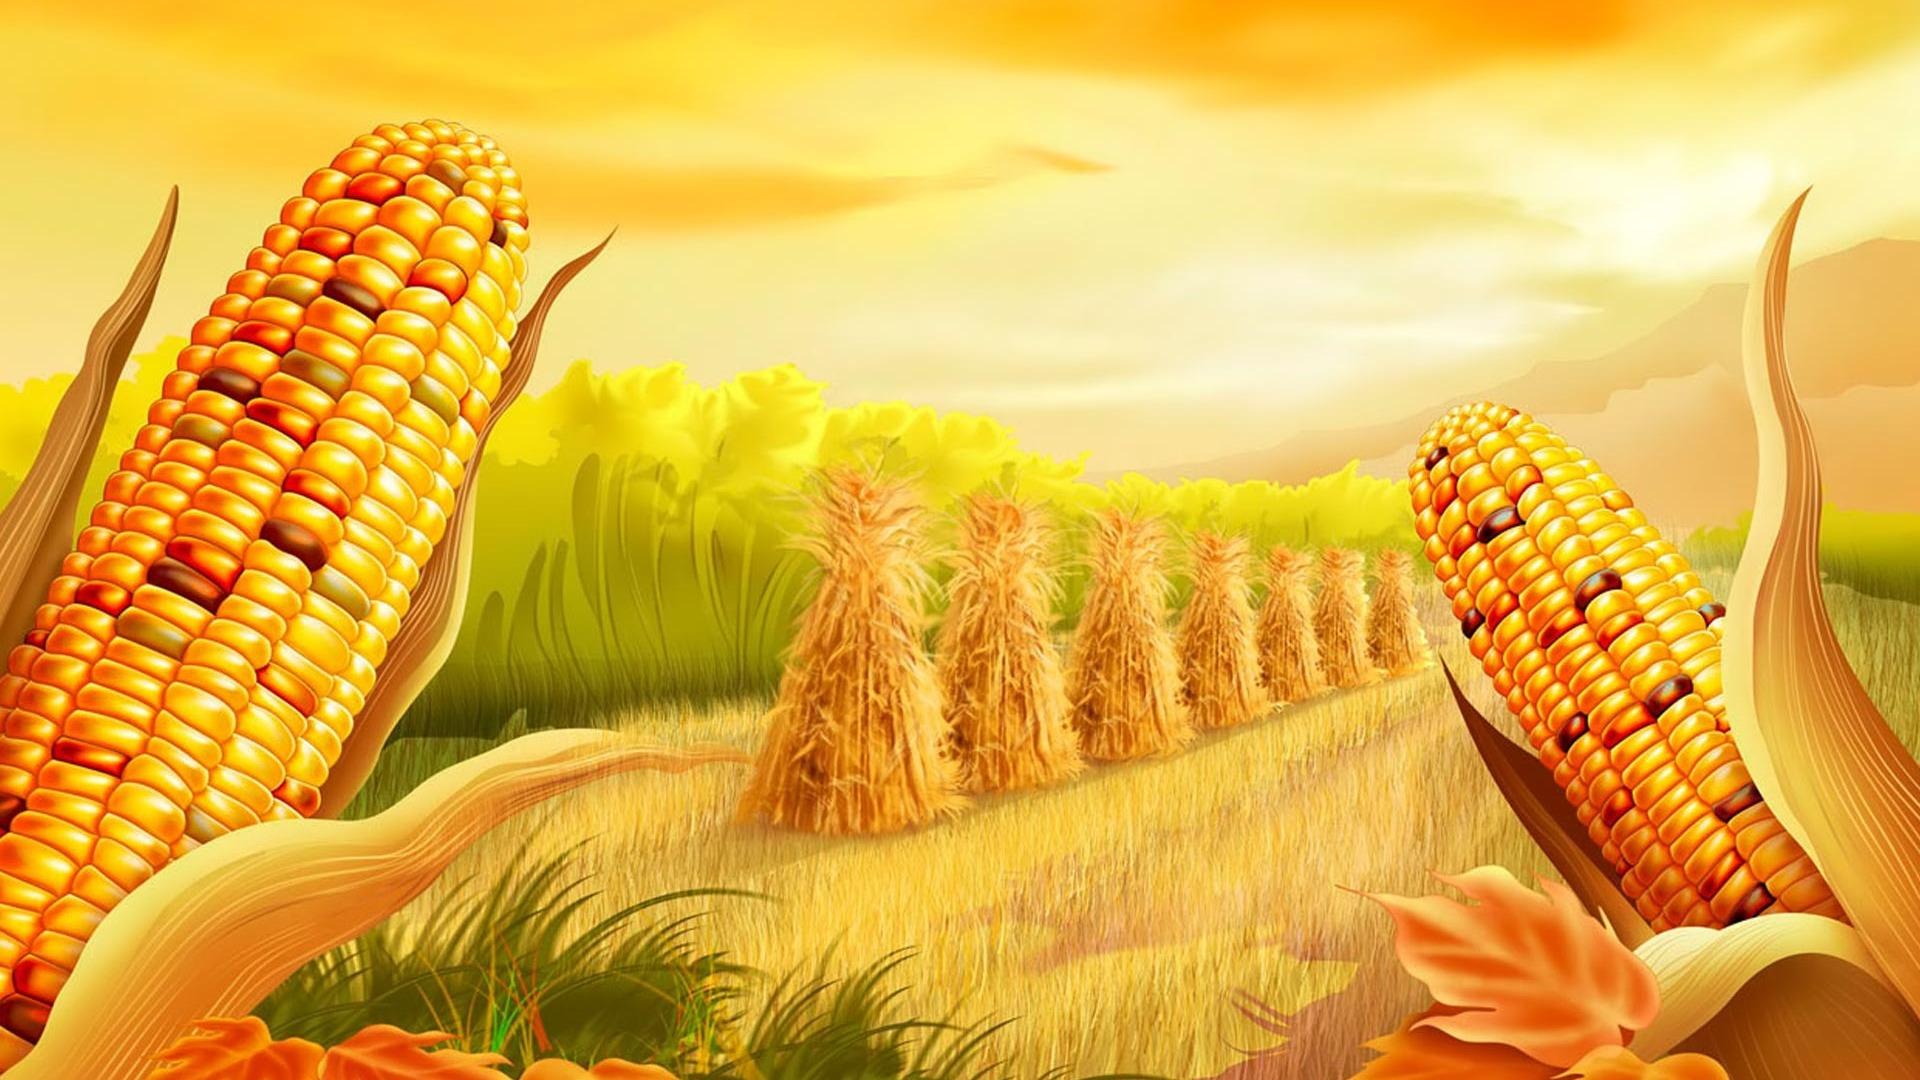 Moril  corn field Computer Wallpapers Desktop Backgrounds 1920x1080